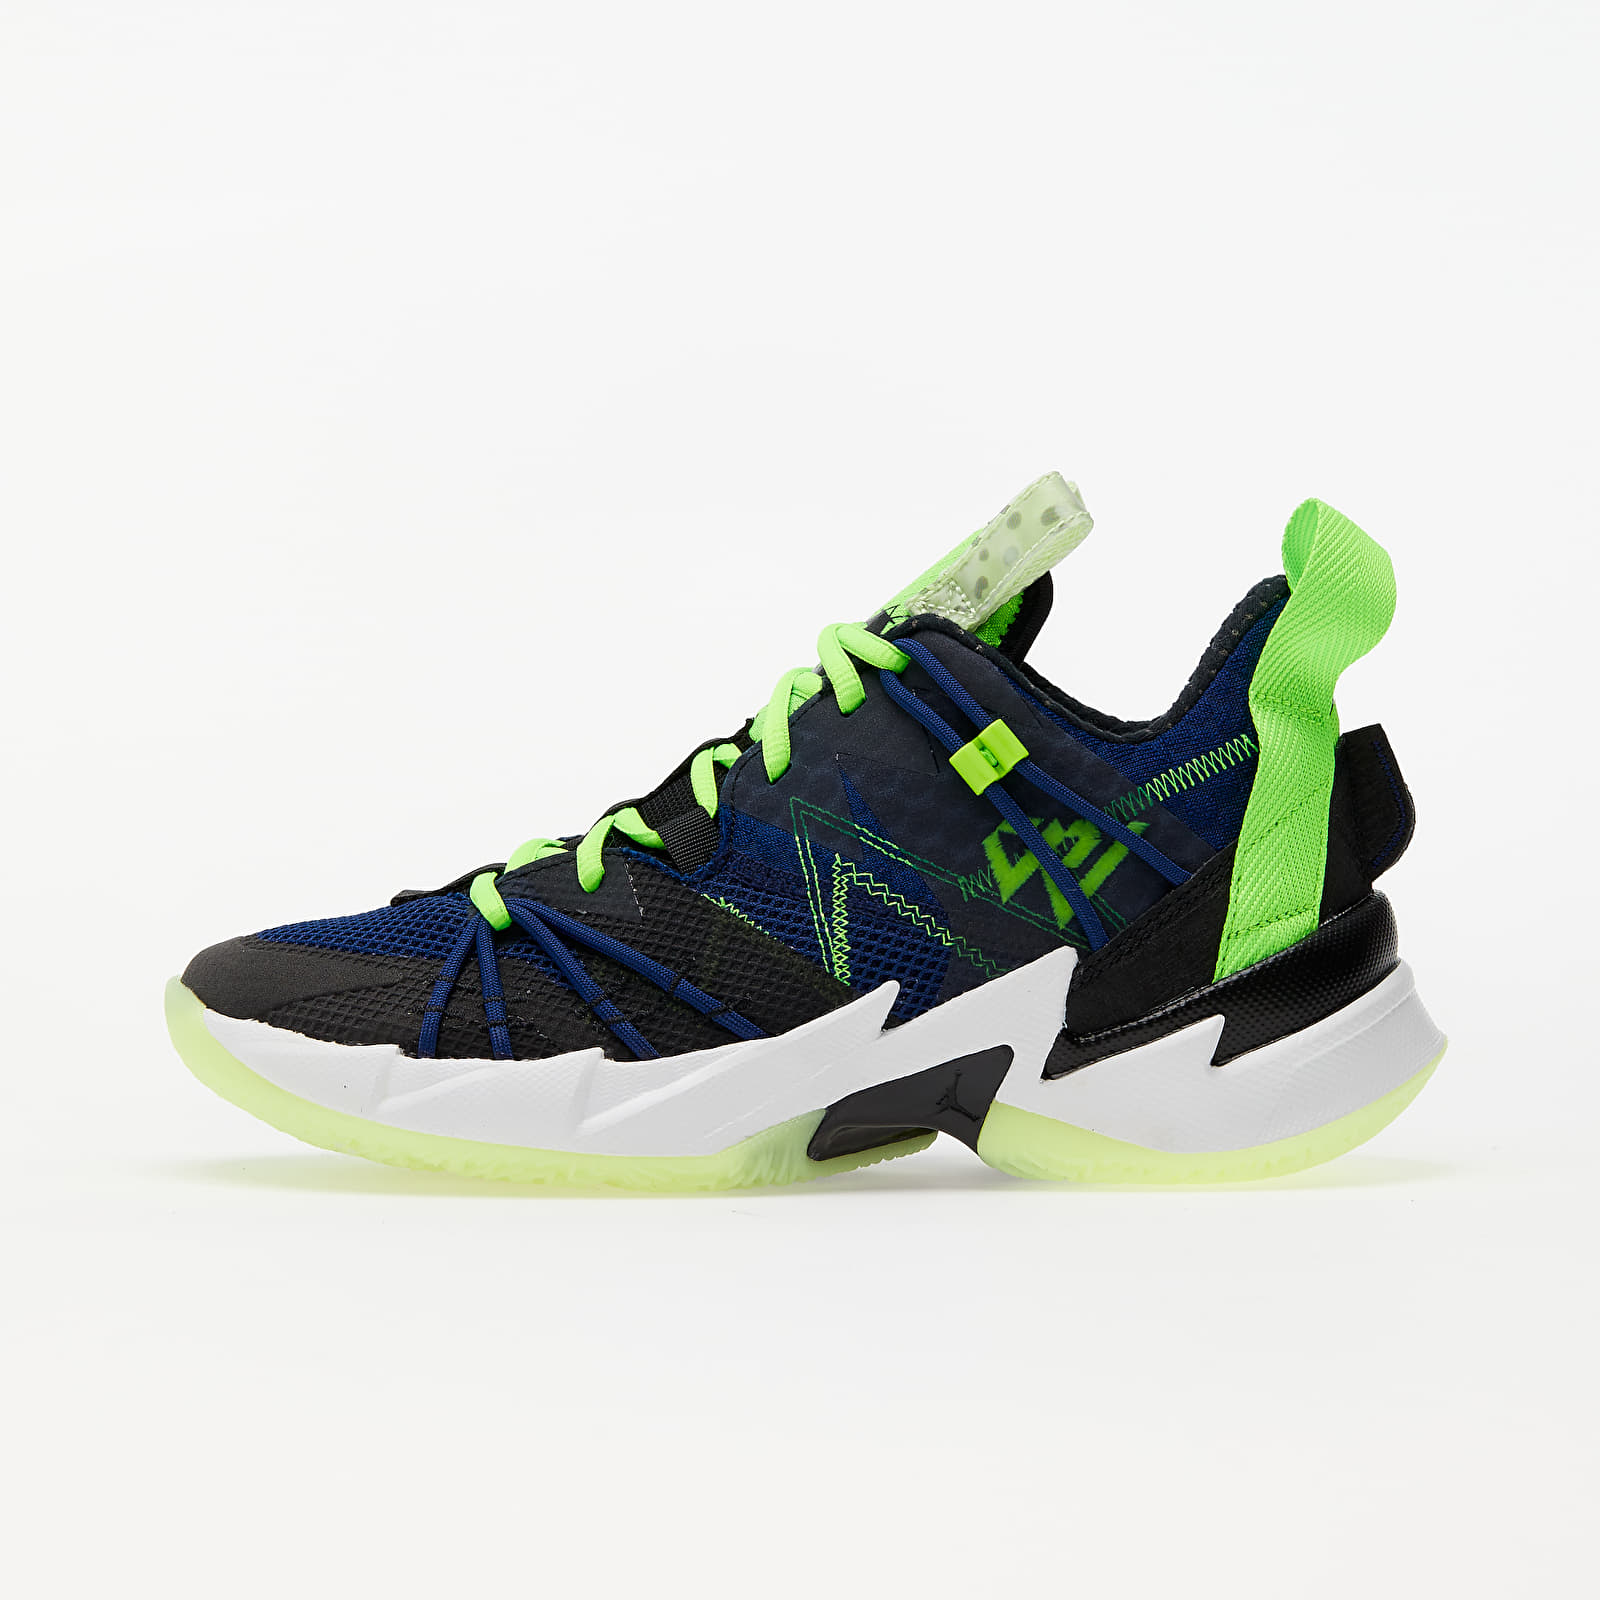 Jordan Why Not Zer0.3 SE Black/ Key Lime-Blue Void-Summit White CK6611-003